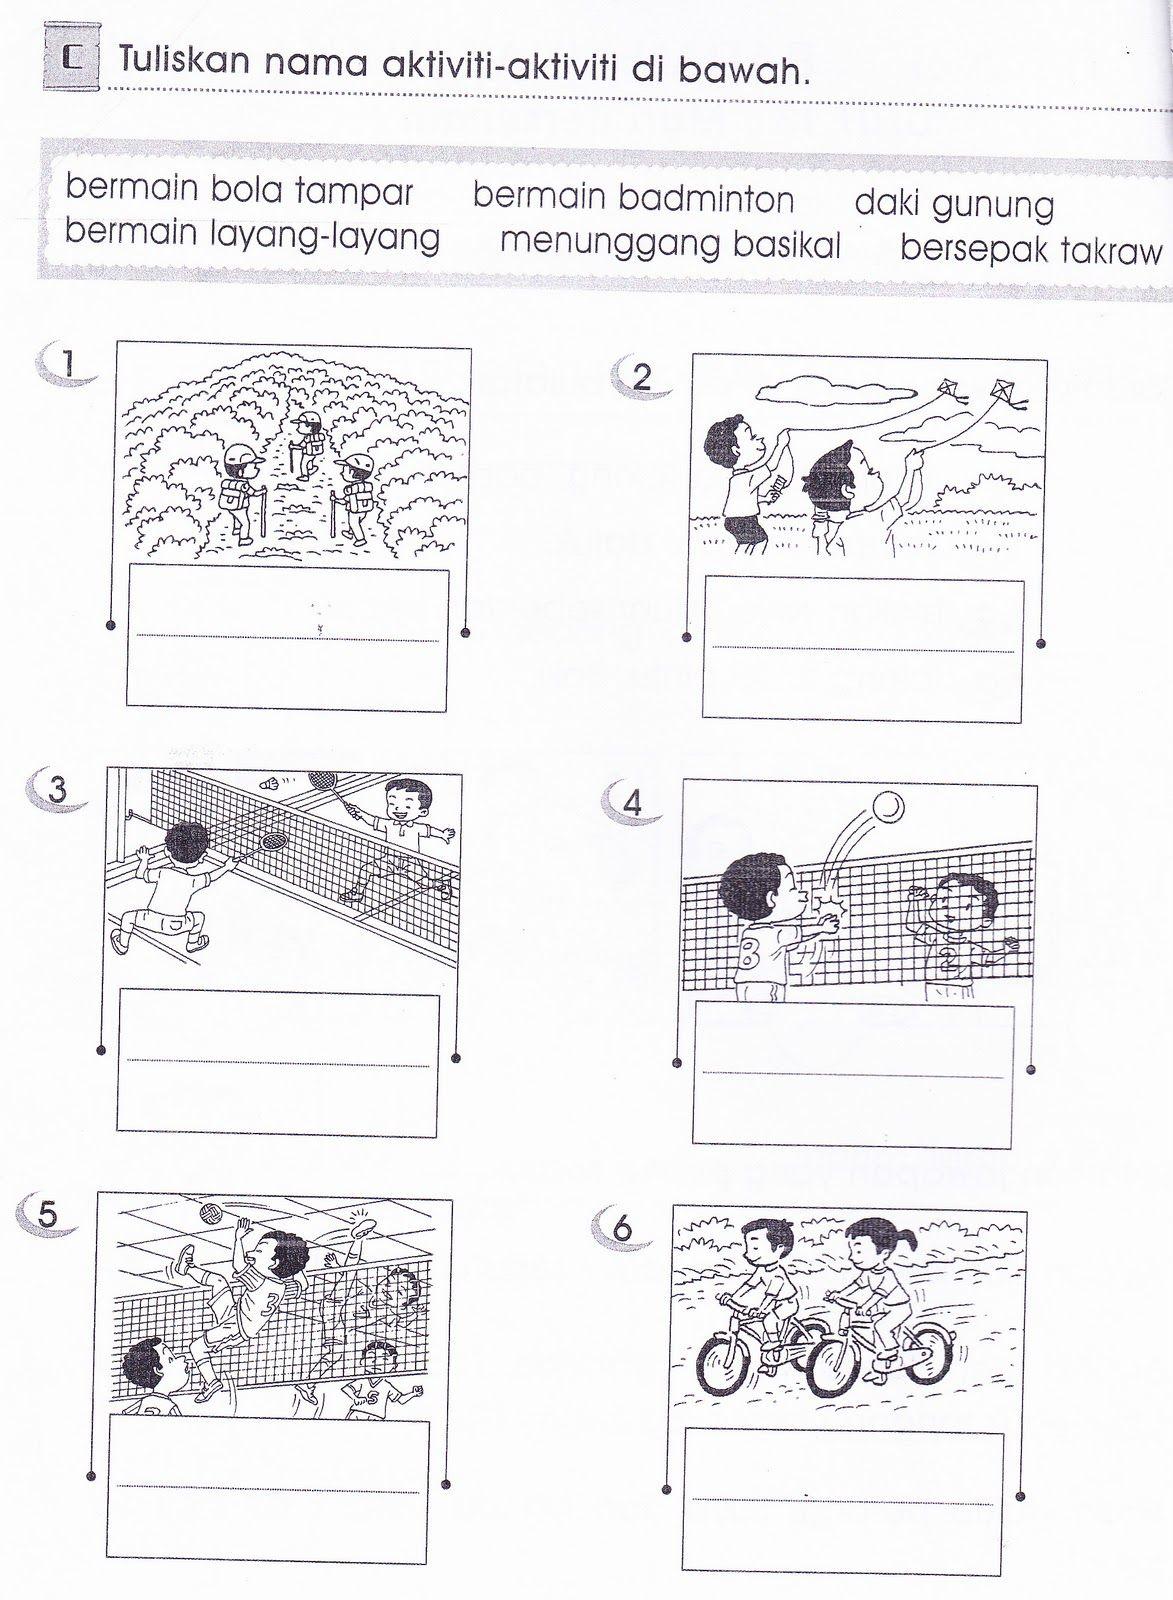 Latihan Bahasa Malaysia Tahun 1 Google Search Preschool Activities Worksheets For Kids Study Materials